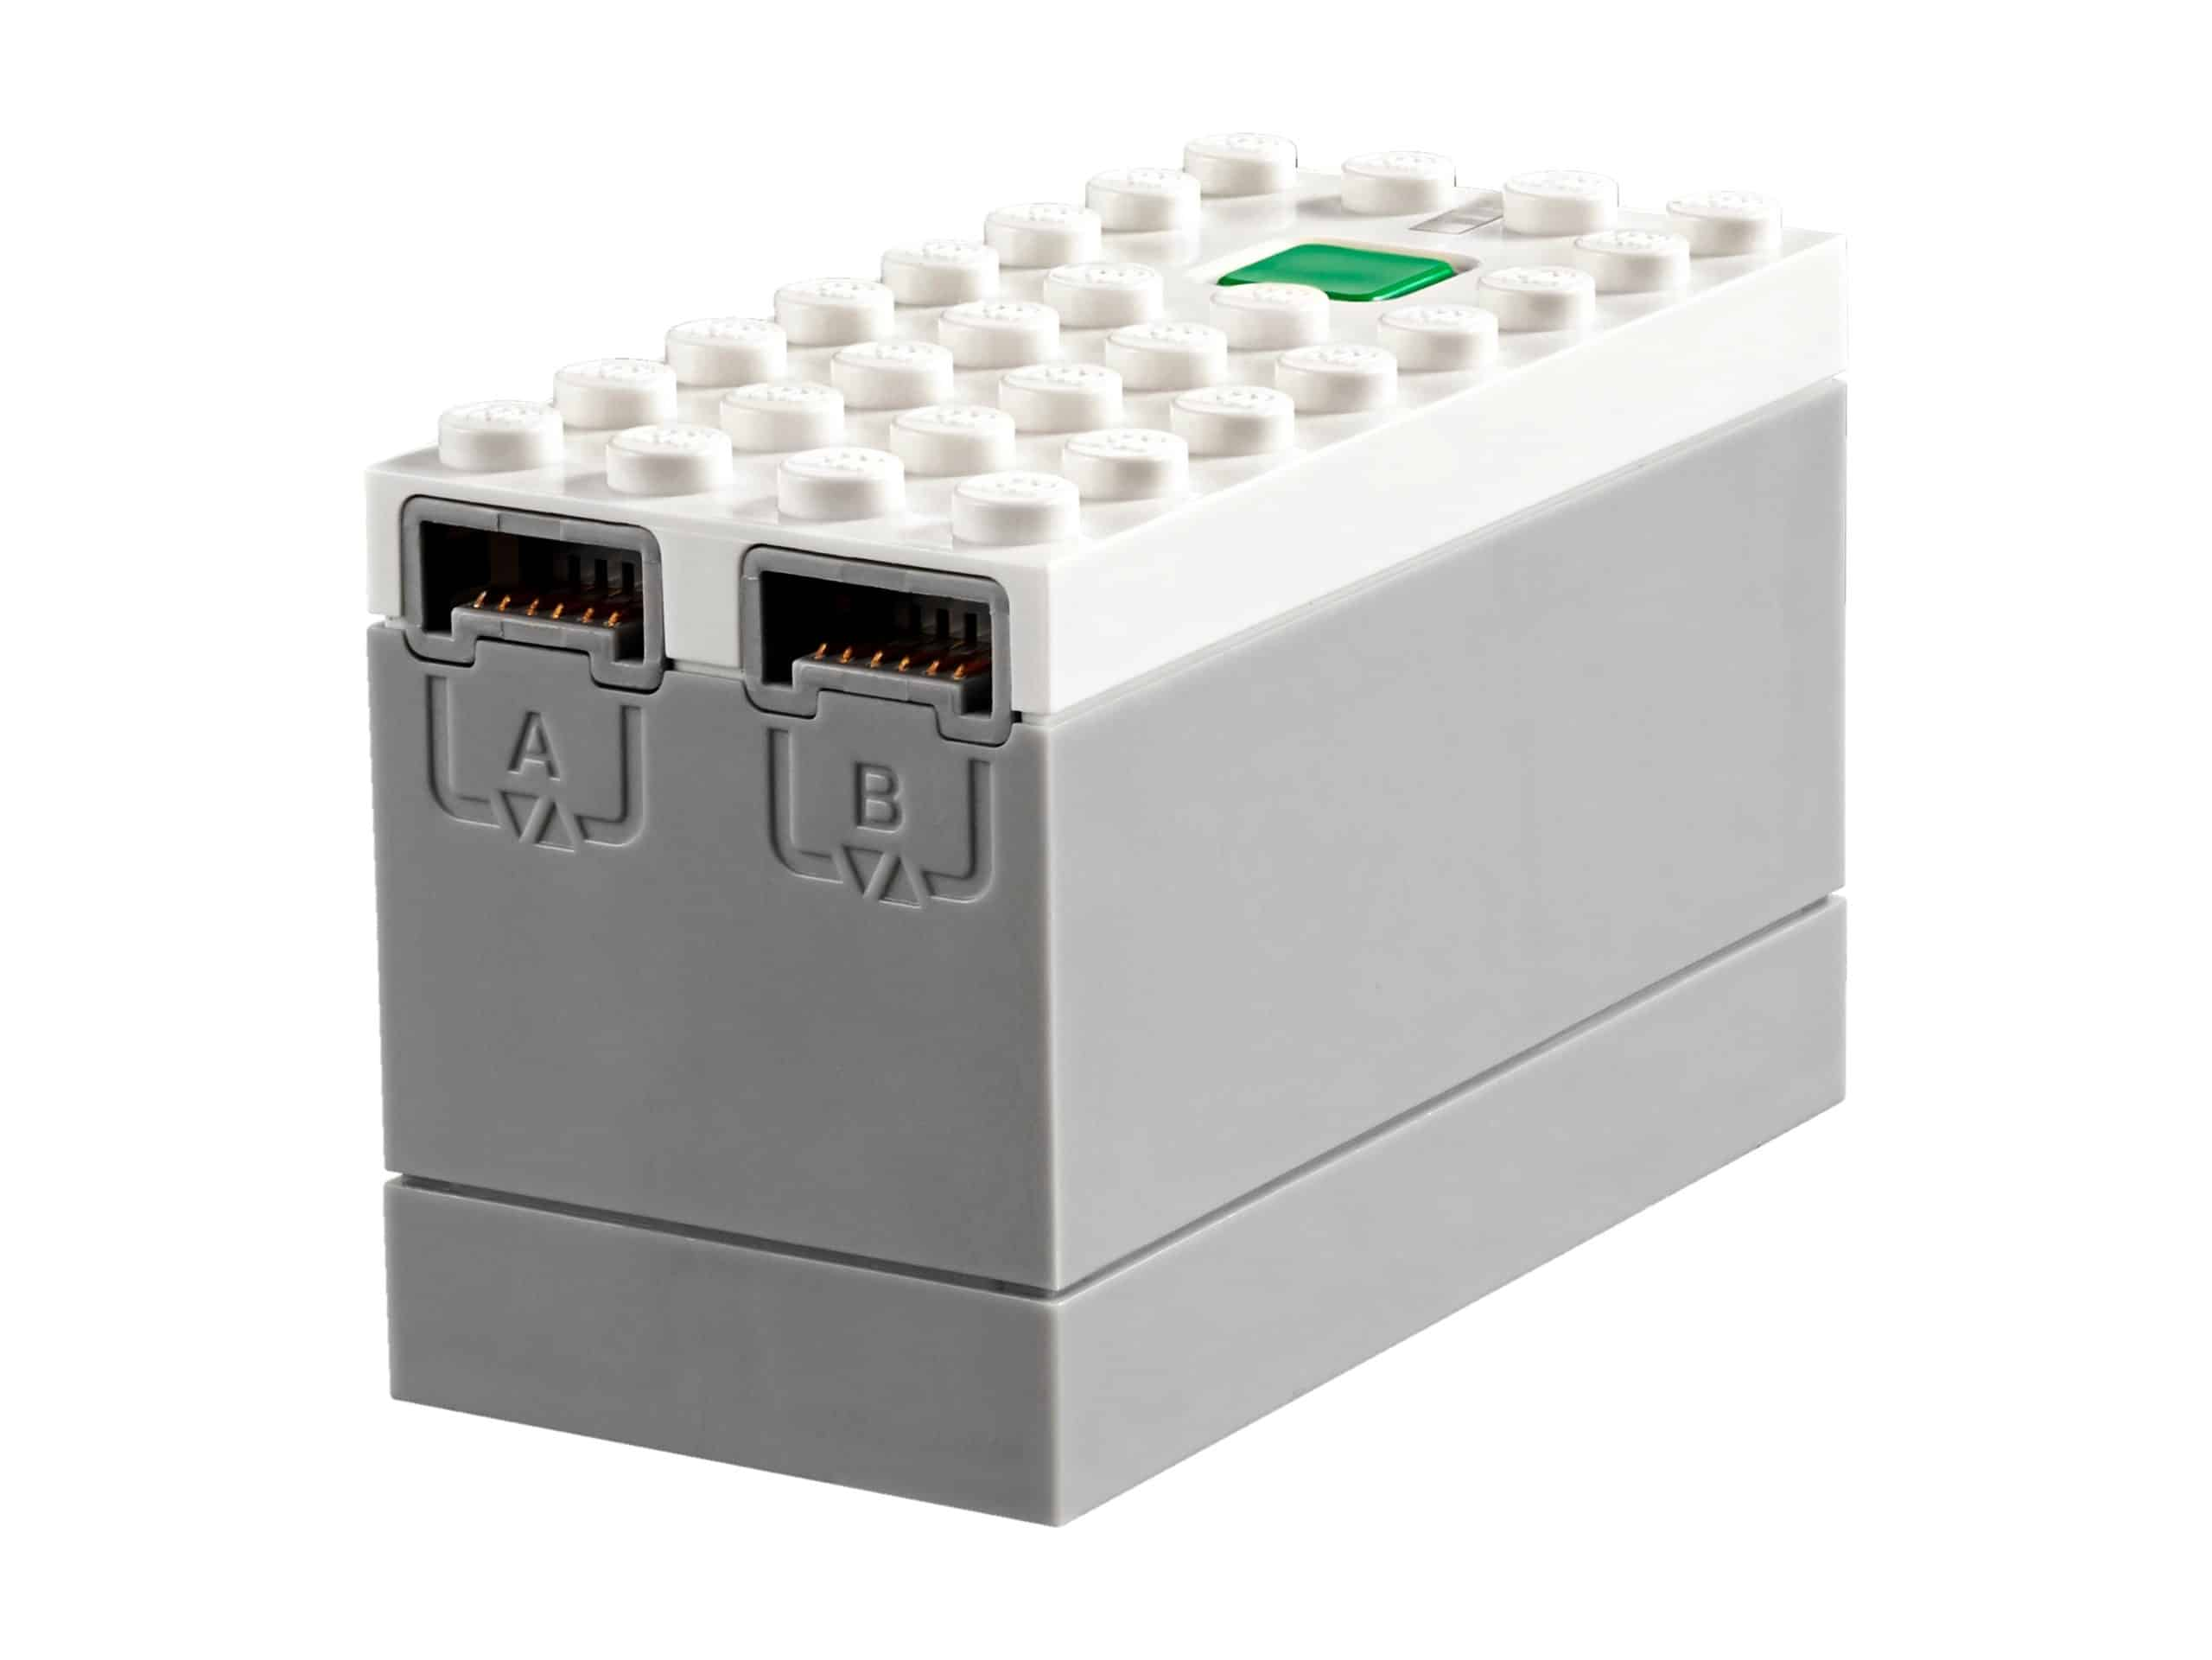 lego 88009 hubb scaled